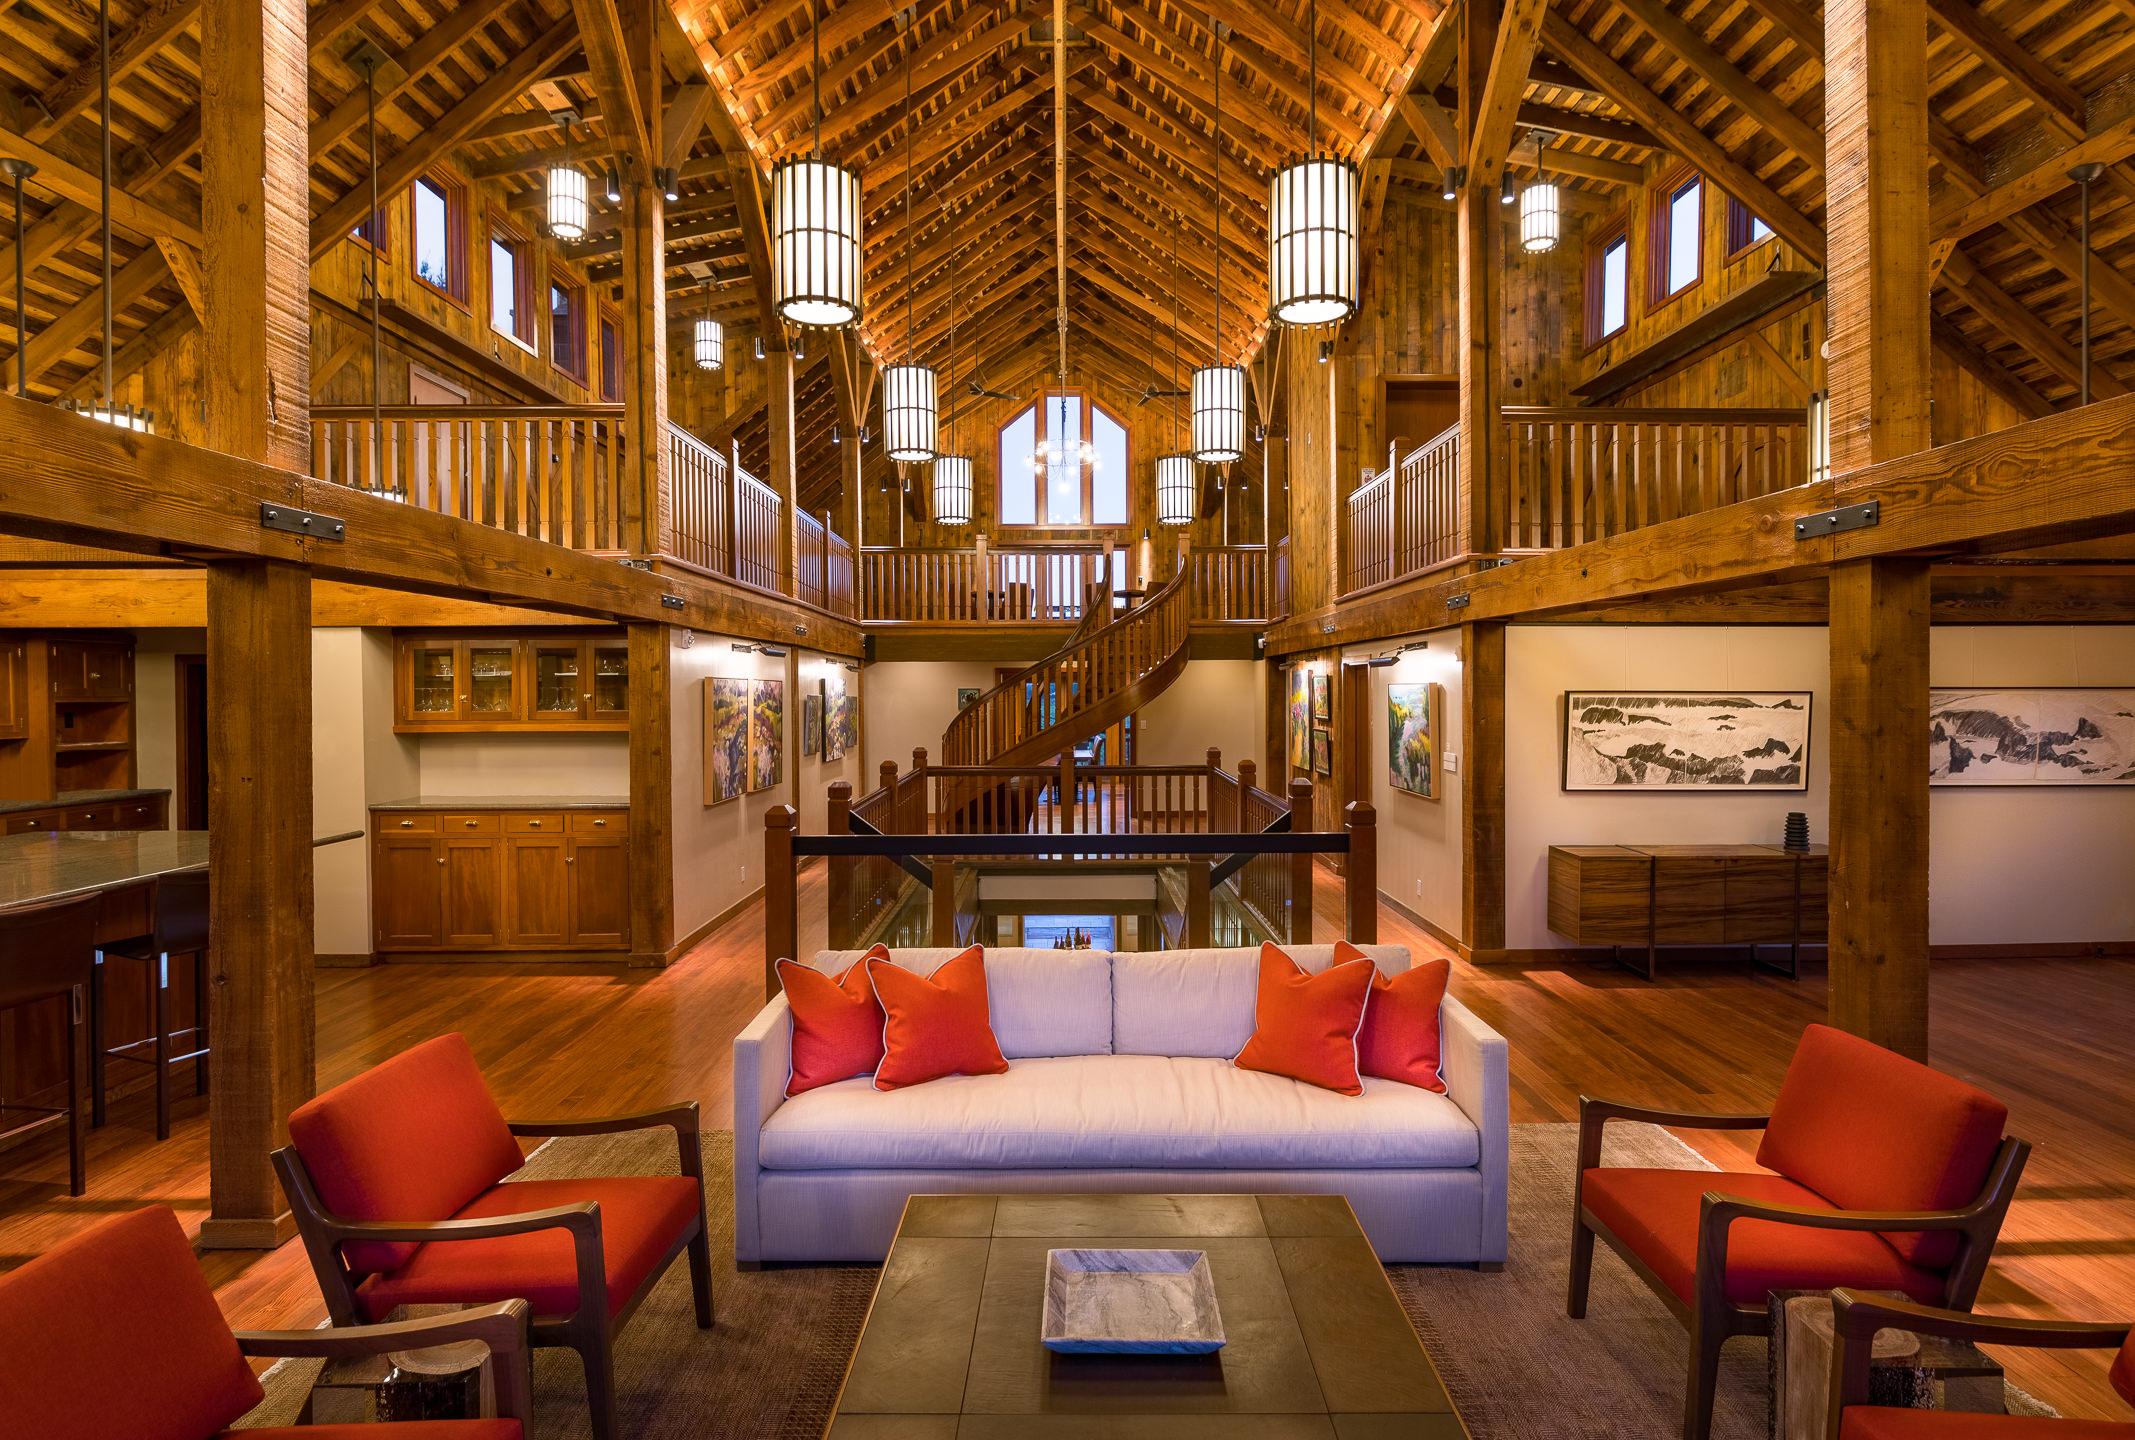 SRP LaCrema Winery Interior Architectural Image 1